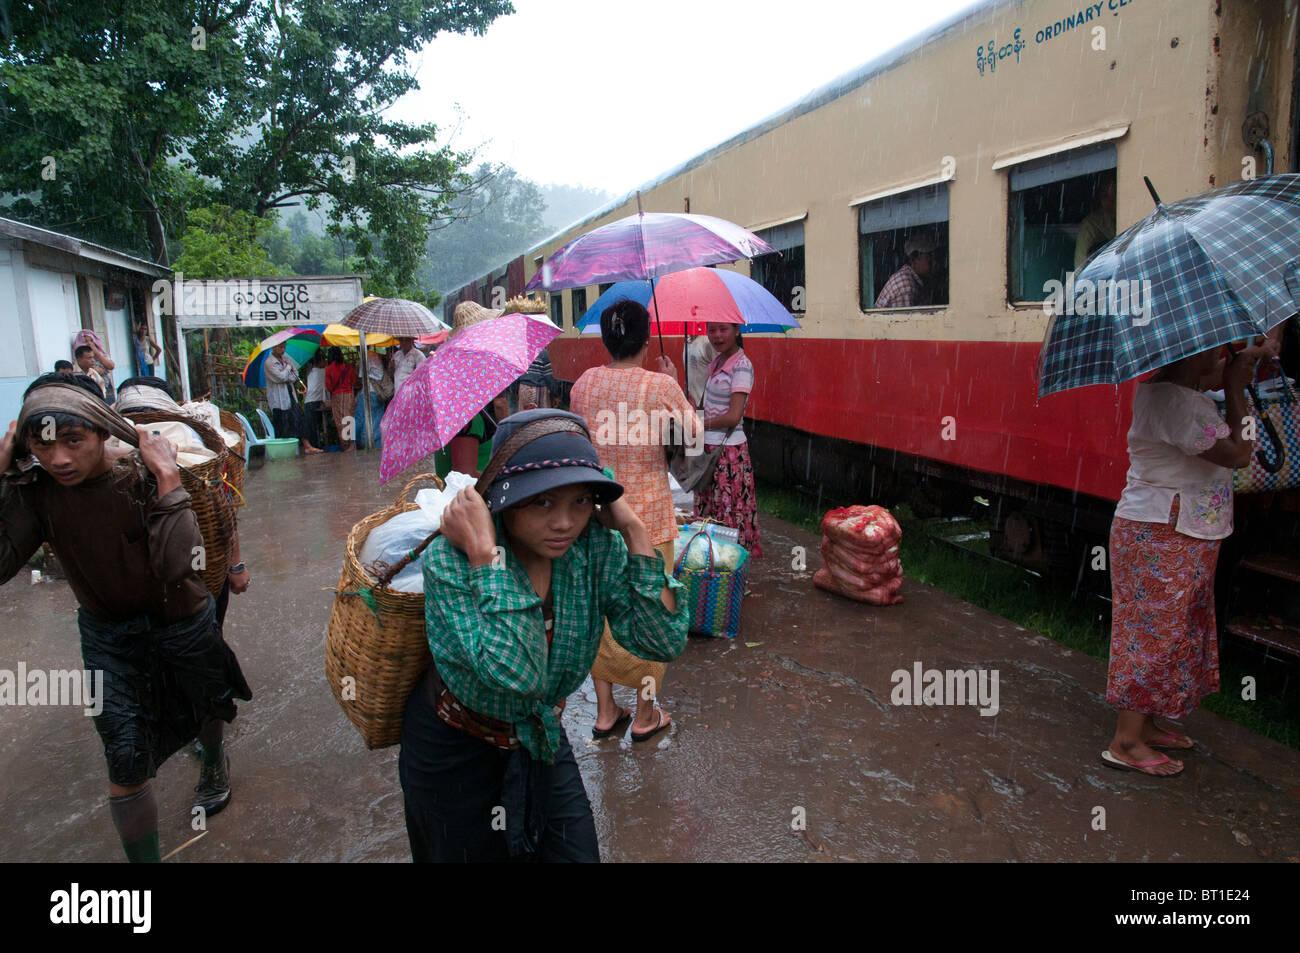 On a Platform under Monsoon Rain in Lebyin Train Station on the Thazi to Shwenyaung train line. Myanmar - Stock Image